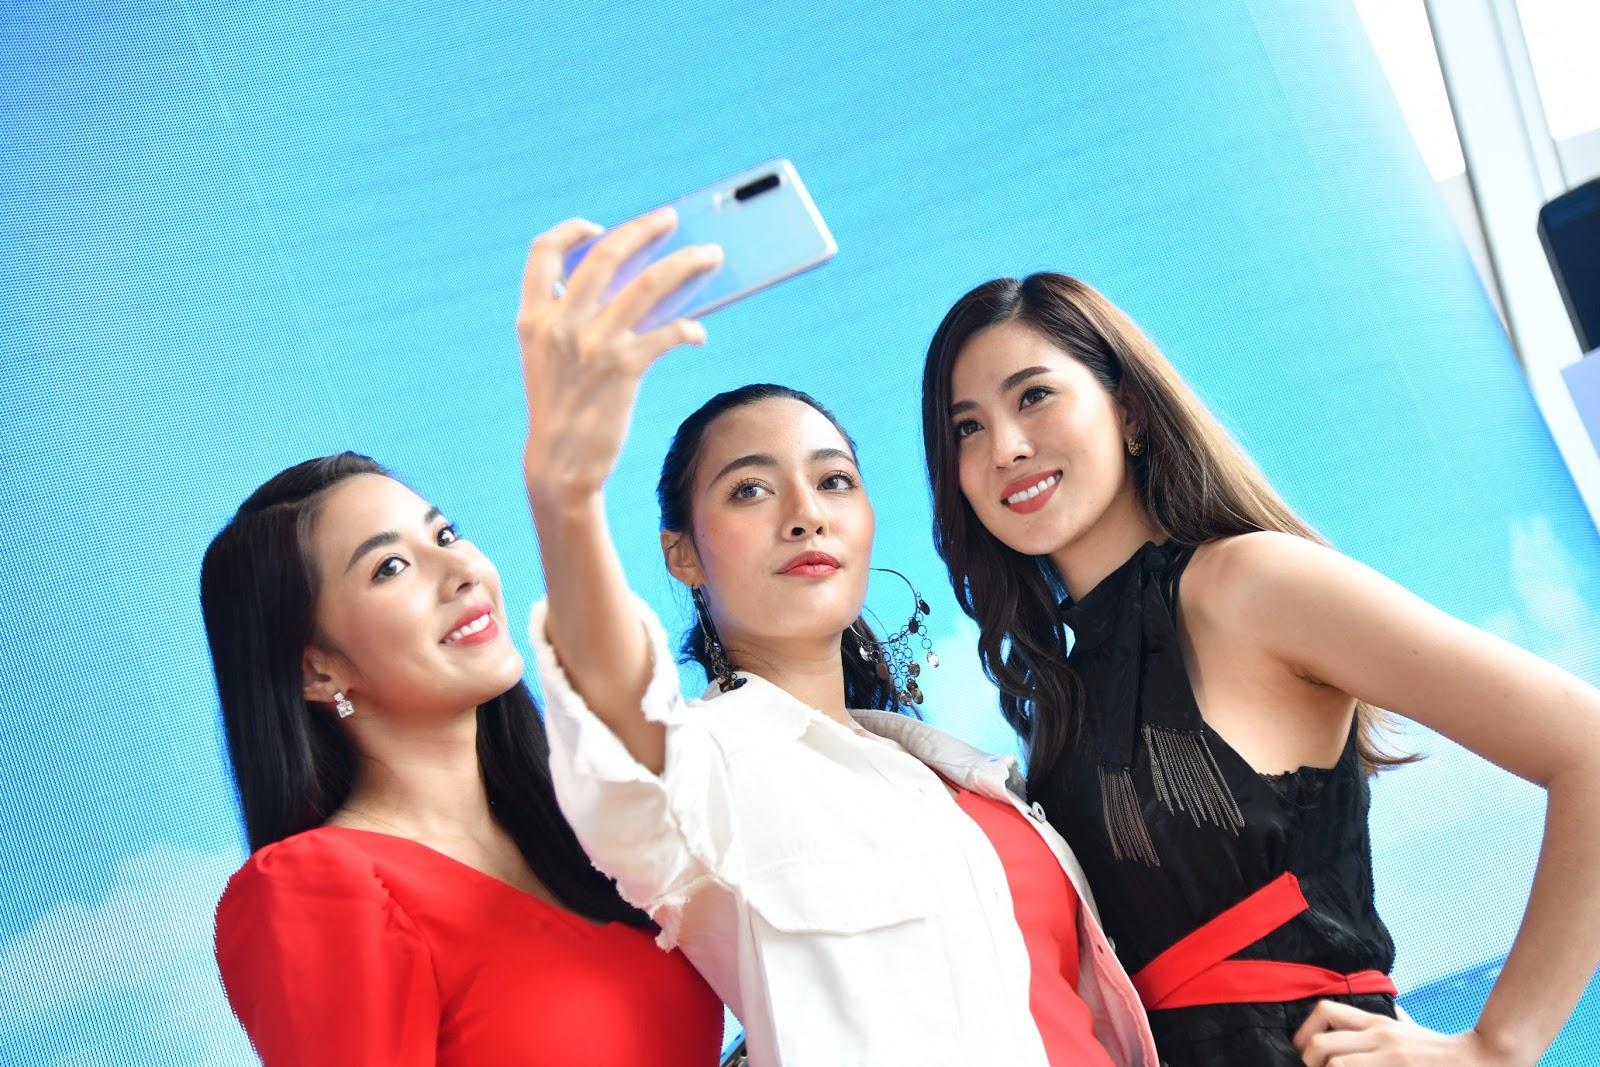 Huawei แนะ5 เทคนิคเทพของการถ่ายภาพ จาก Rockkhound ช่างภาพสุดแนว